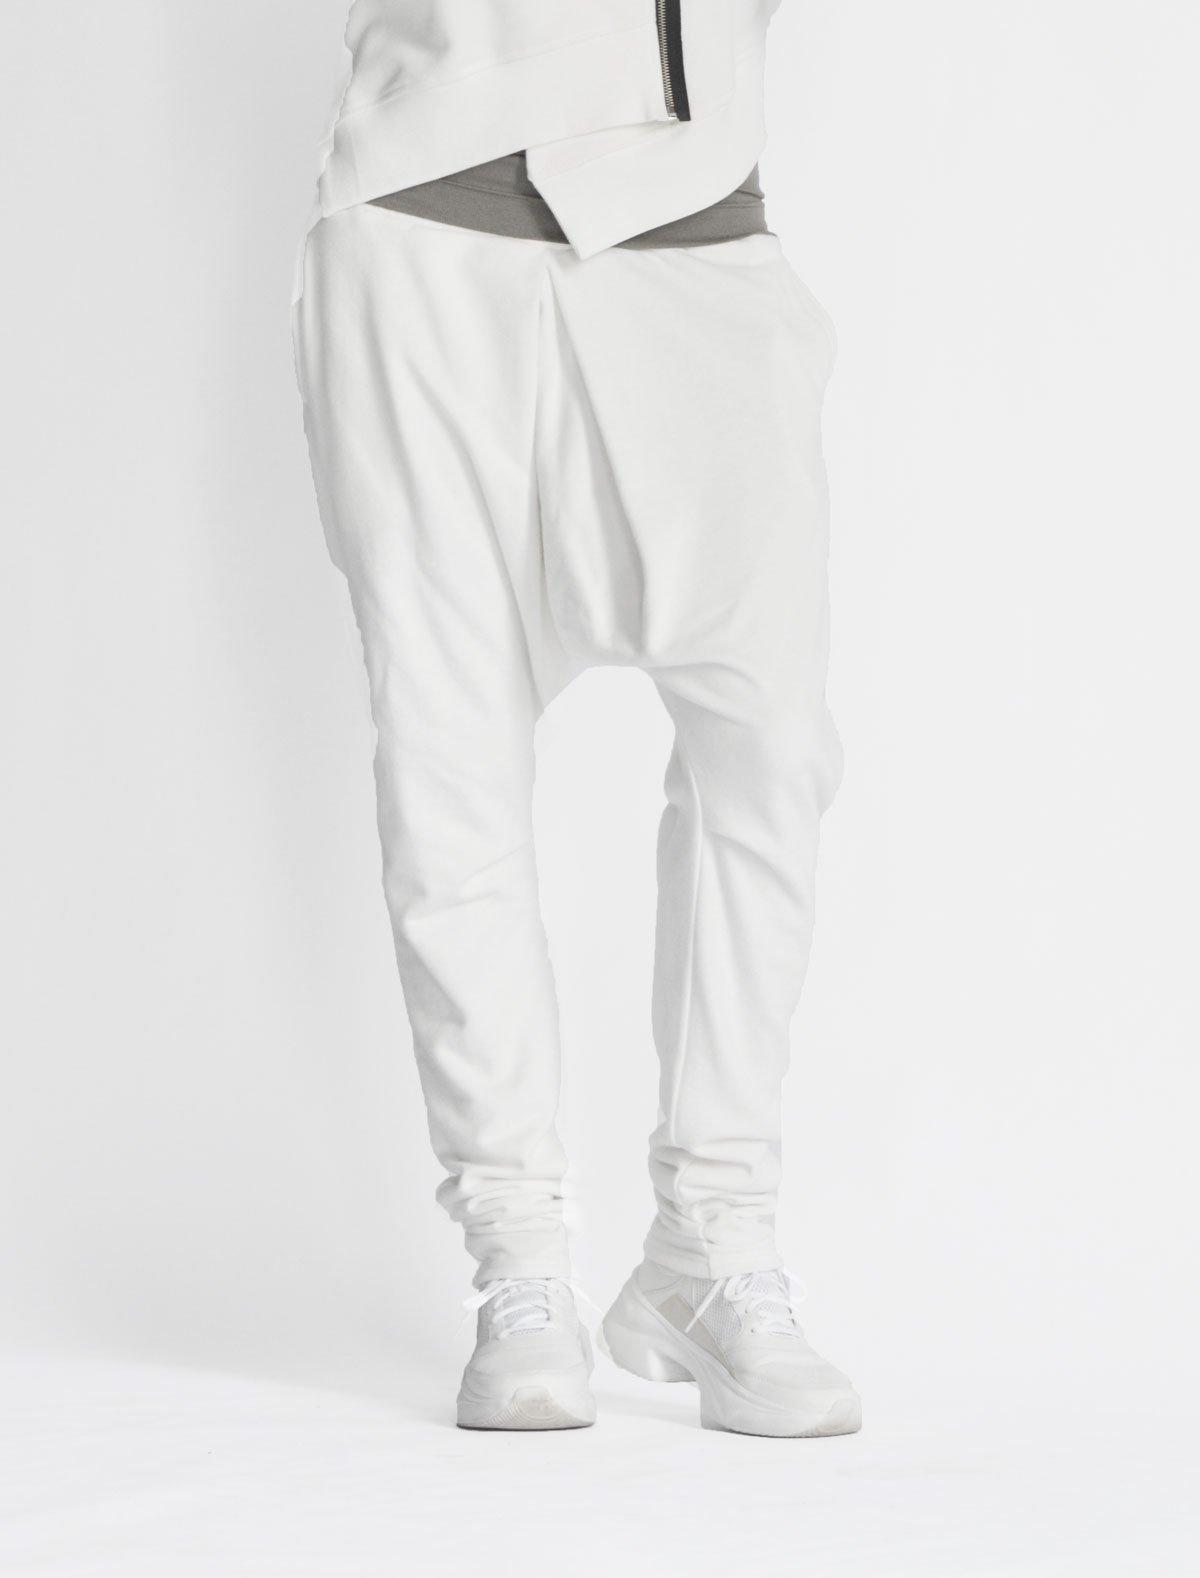 2016 Loose Casual Drop Crotch Linen Harem Pants  Extravagant Drop Crotch Linen Pants Cropped Shorts by AakashaMen A05588M